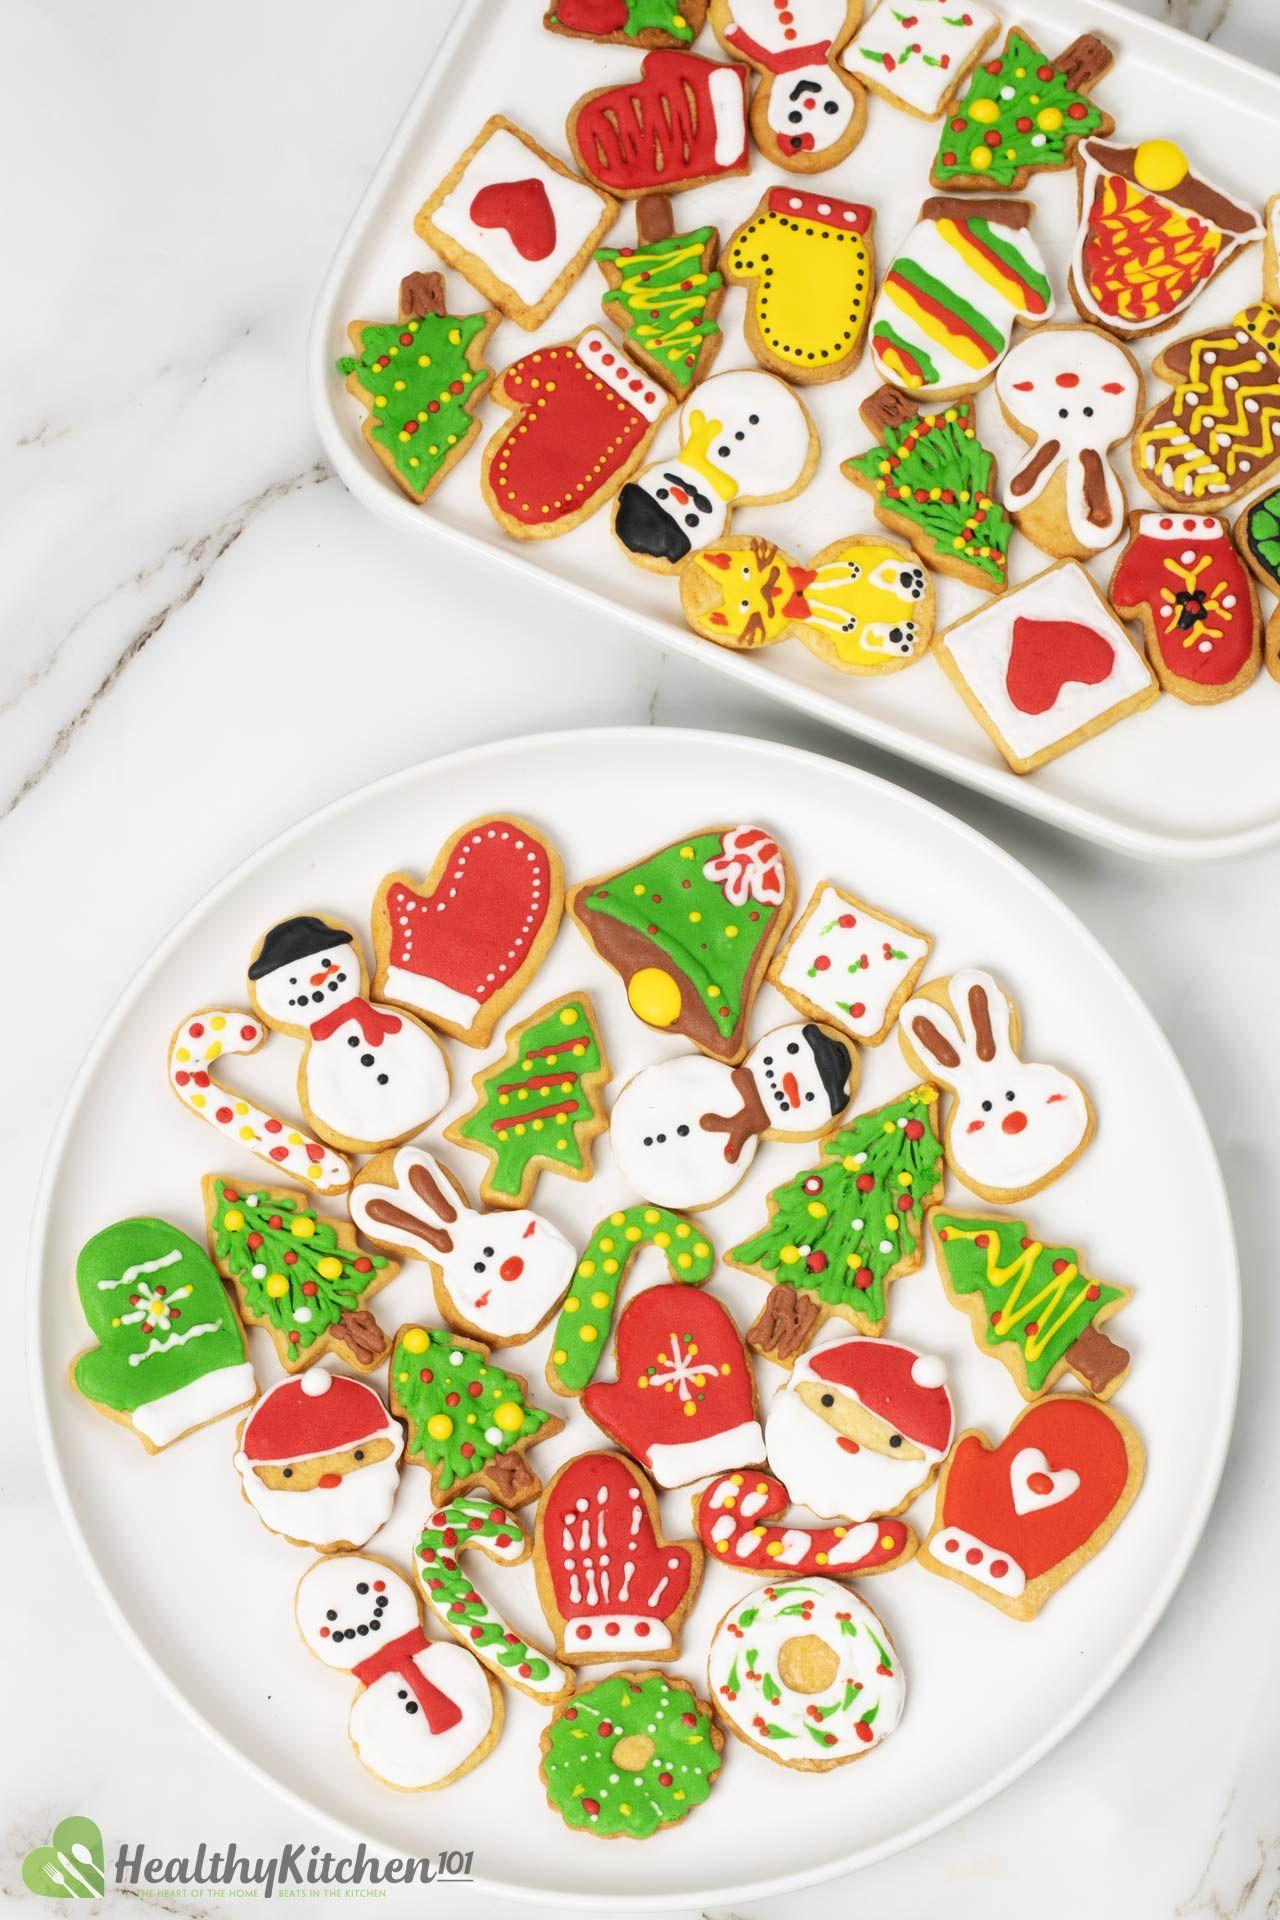 Are Sugar Cookies healthy